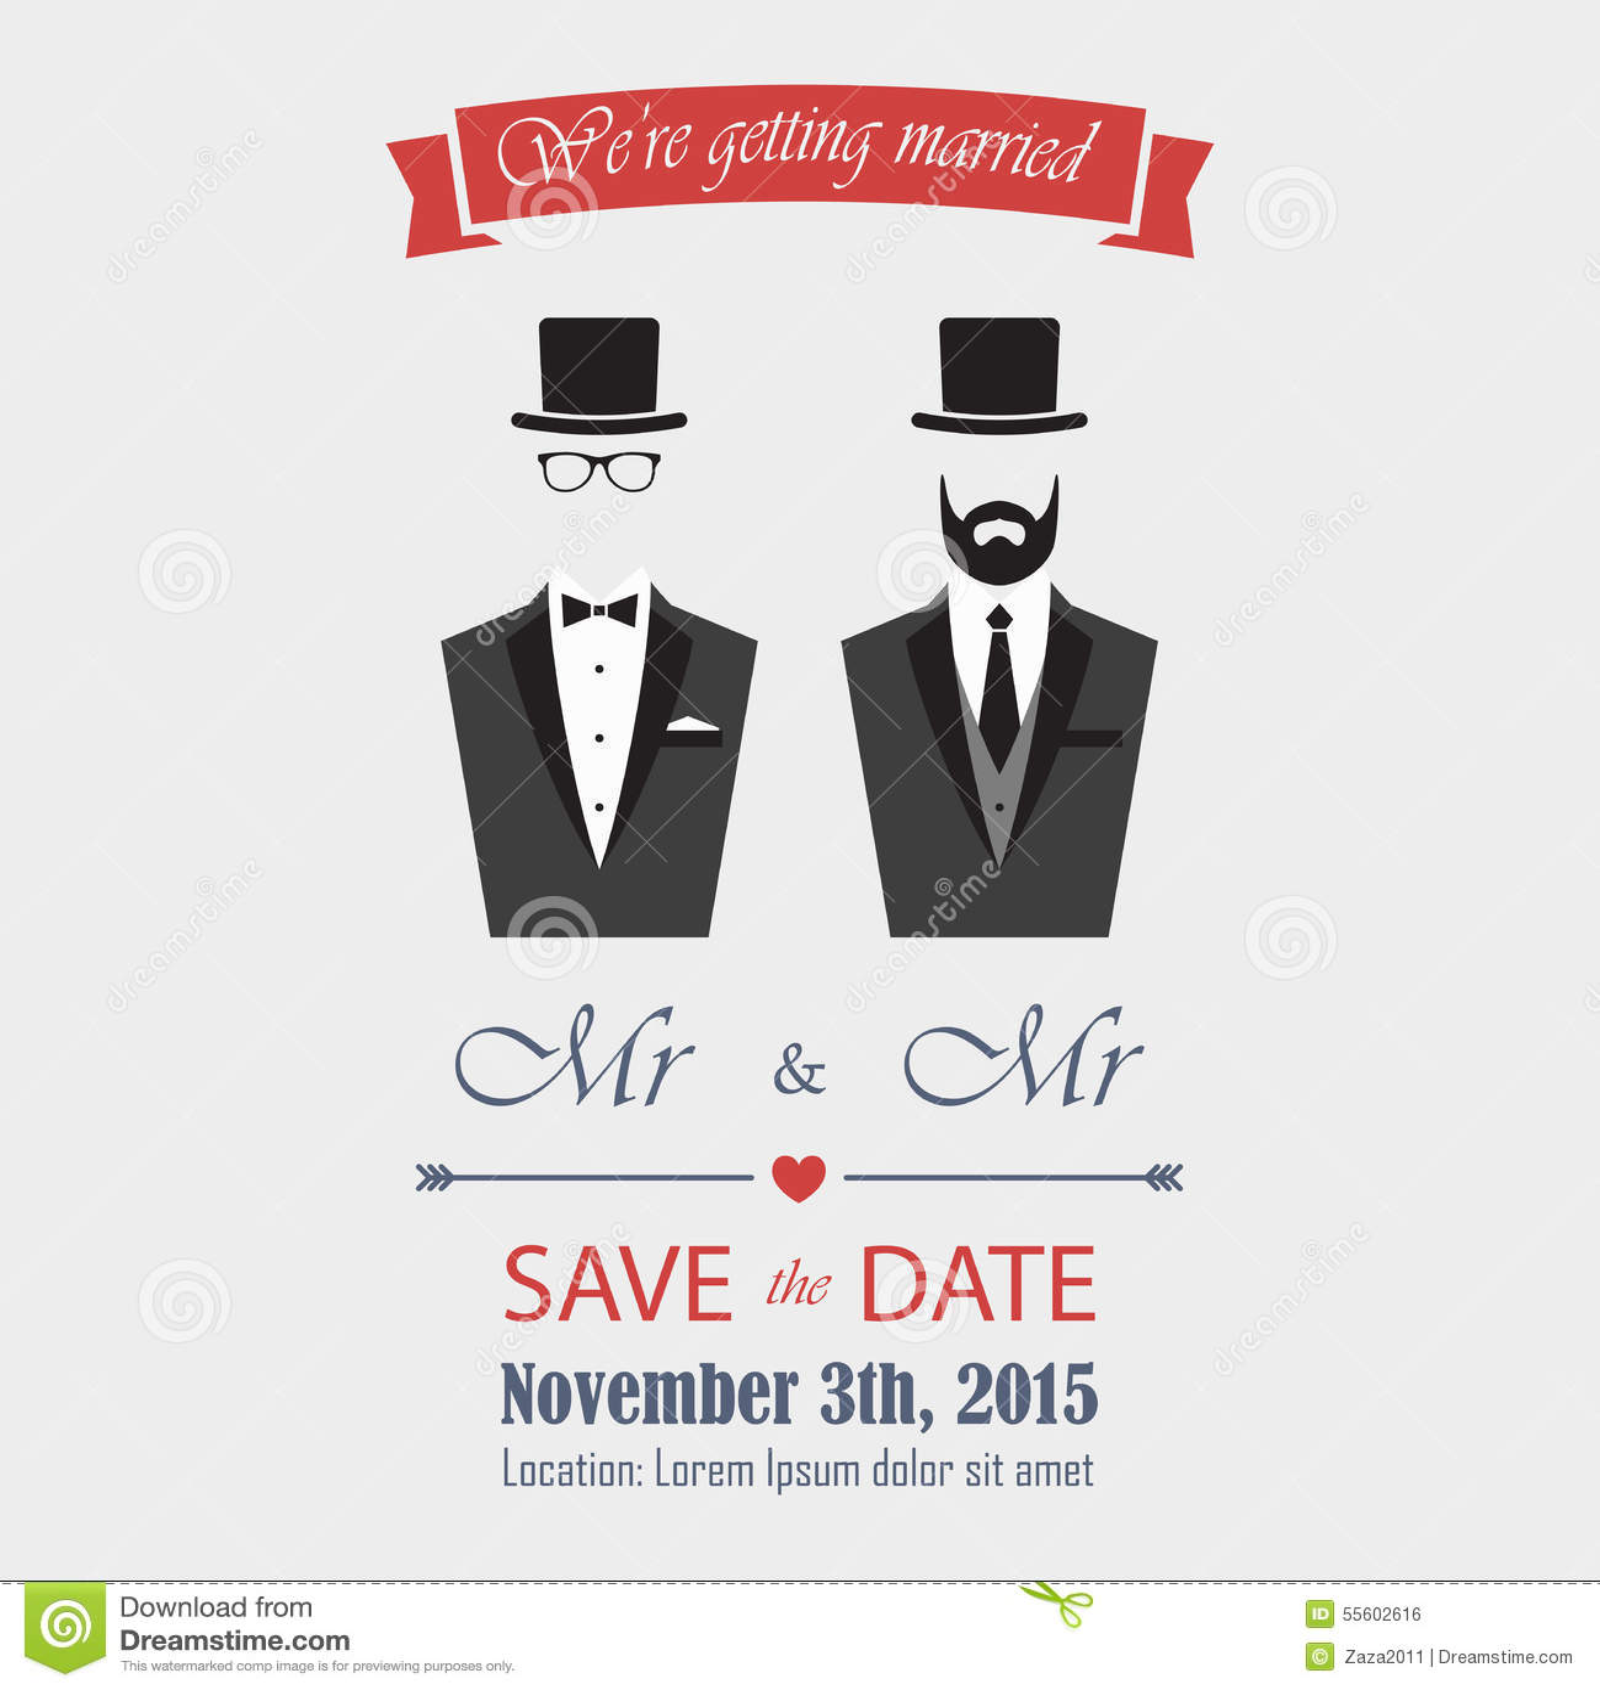 royalty free vector download gay wedding invitation - Same Sex Wedding Invitations